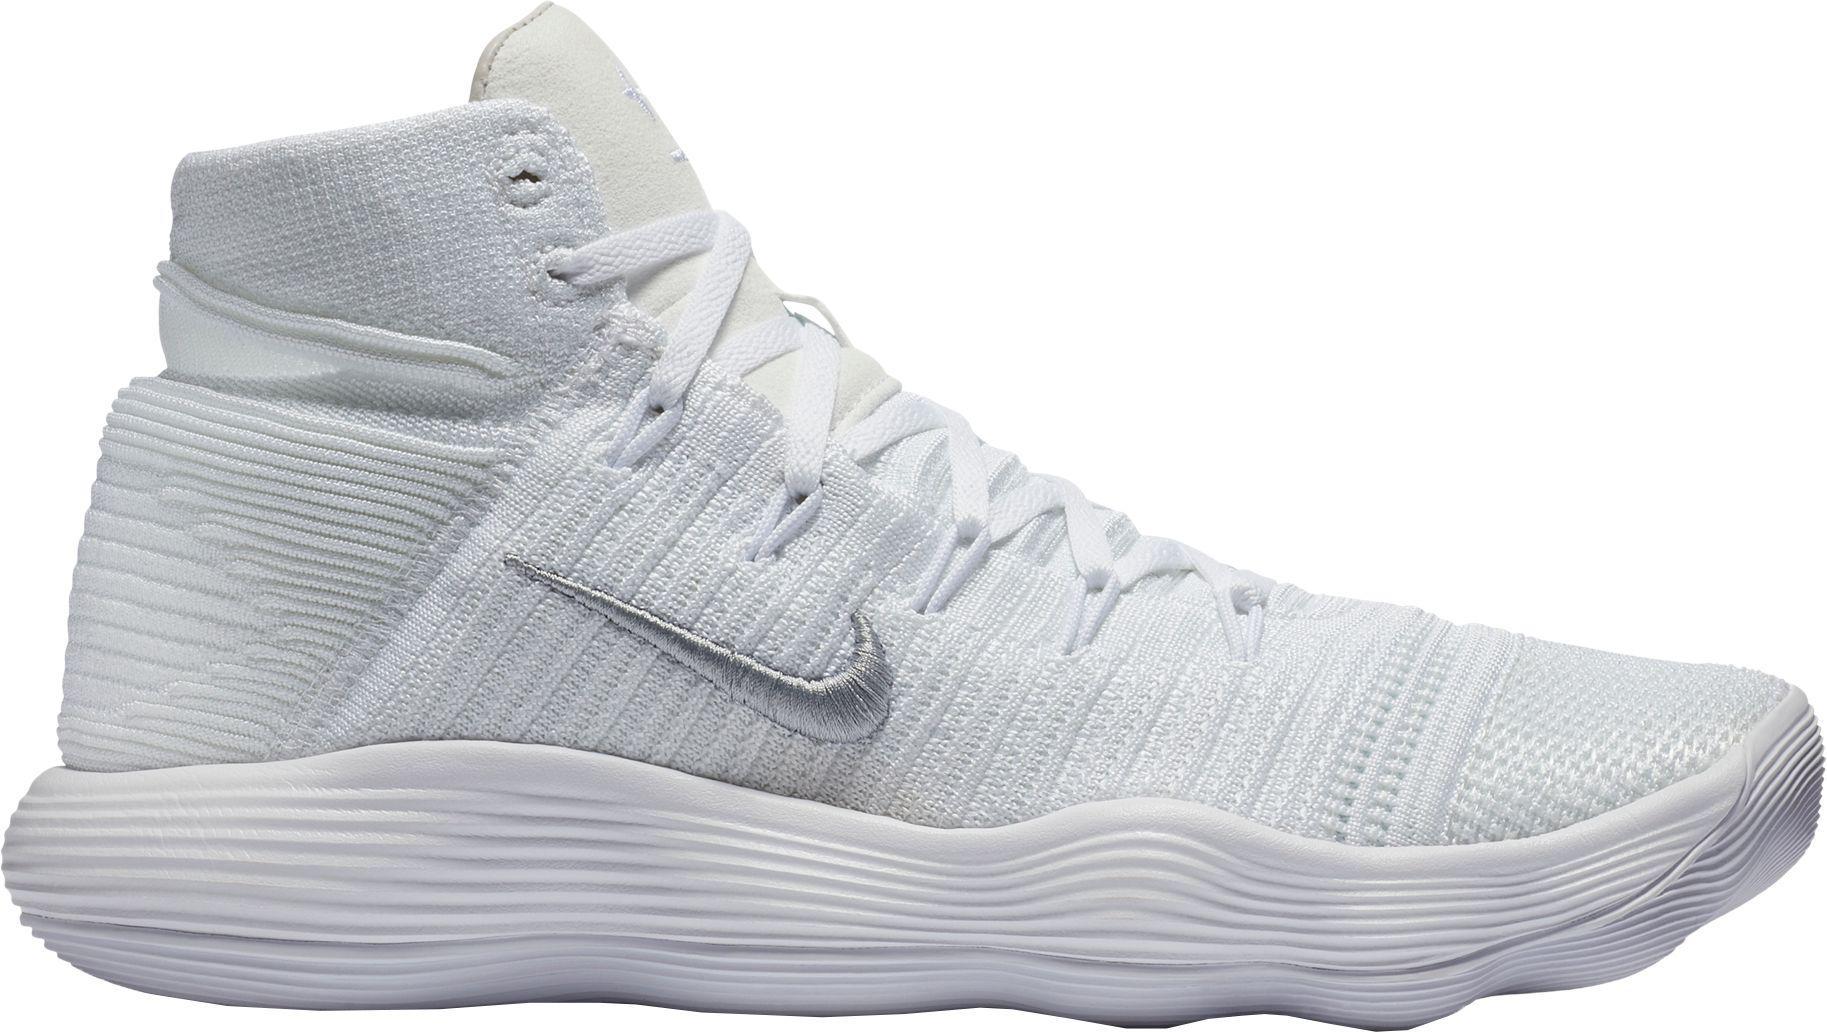 0f38dbfeee7 Nike - White React Hyperdunk 2017 Flyknit Basketball Shoes for Men - Lyst